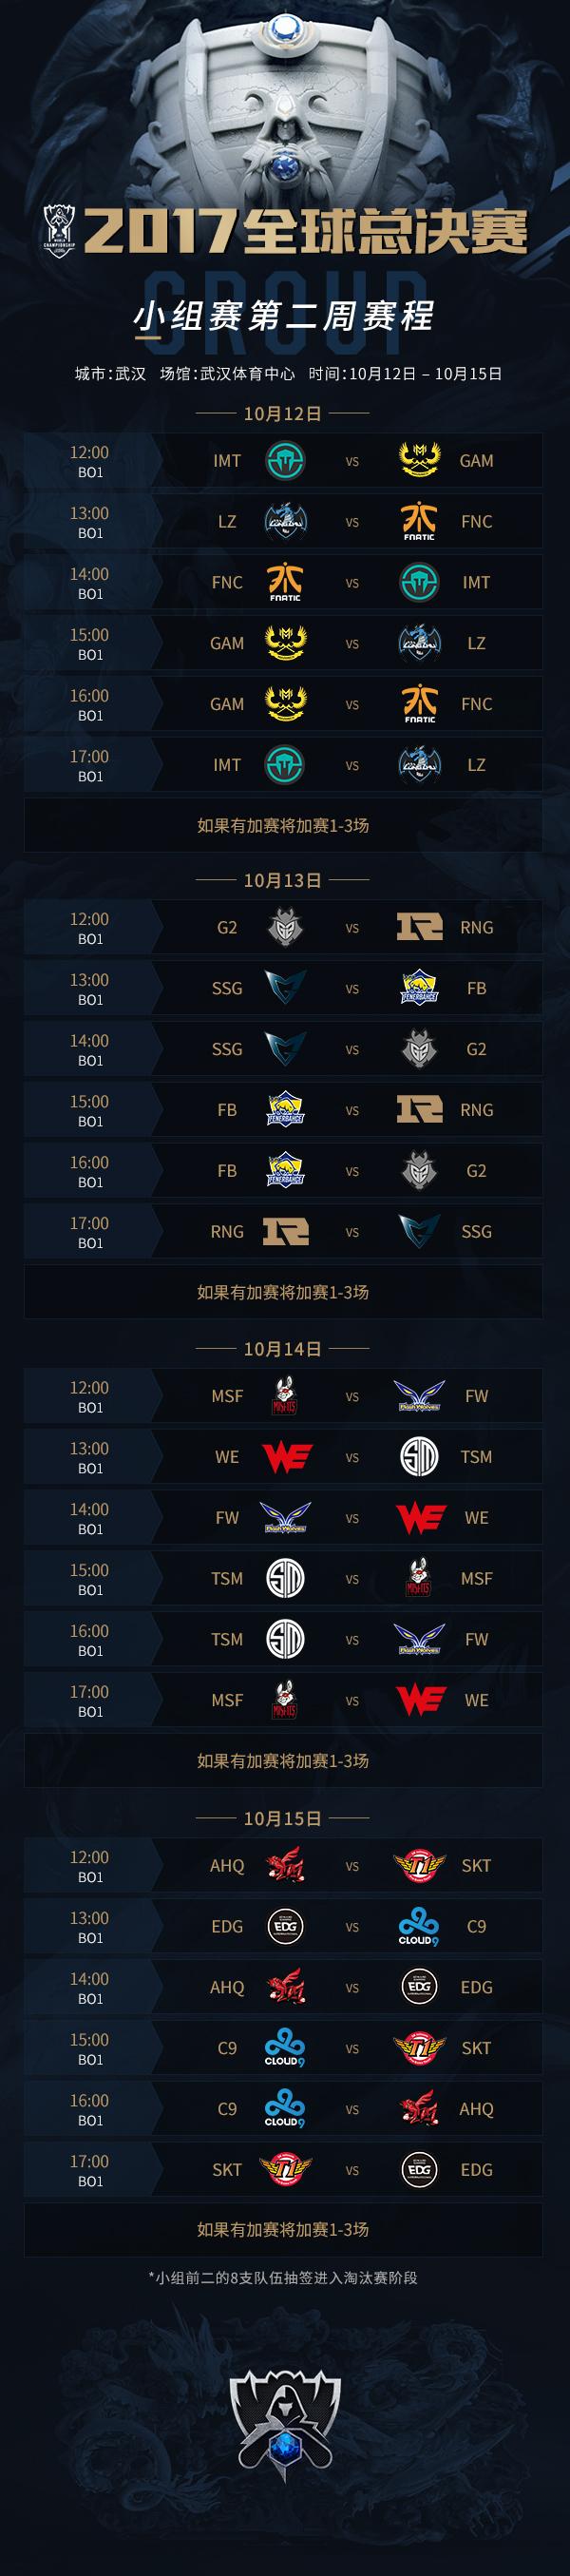 LOLs7总决赛小组赛第2轮赛程公布 12日无LPL战队比赛